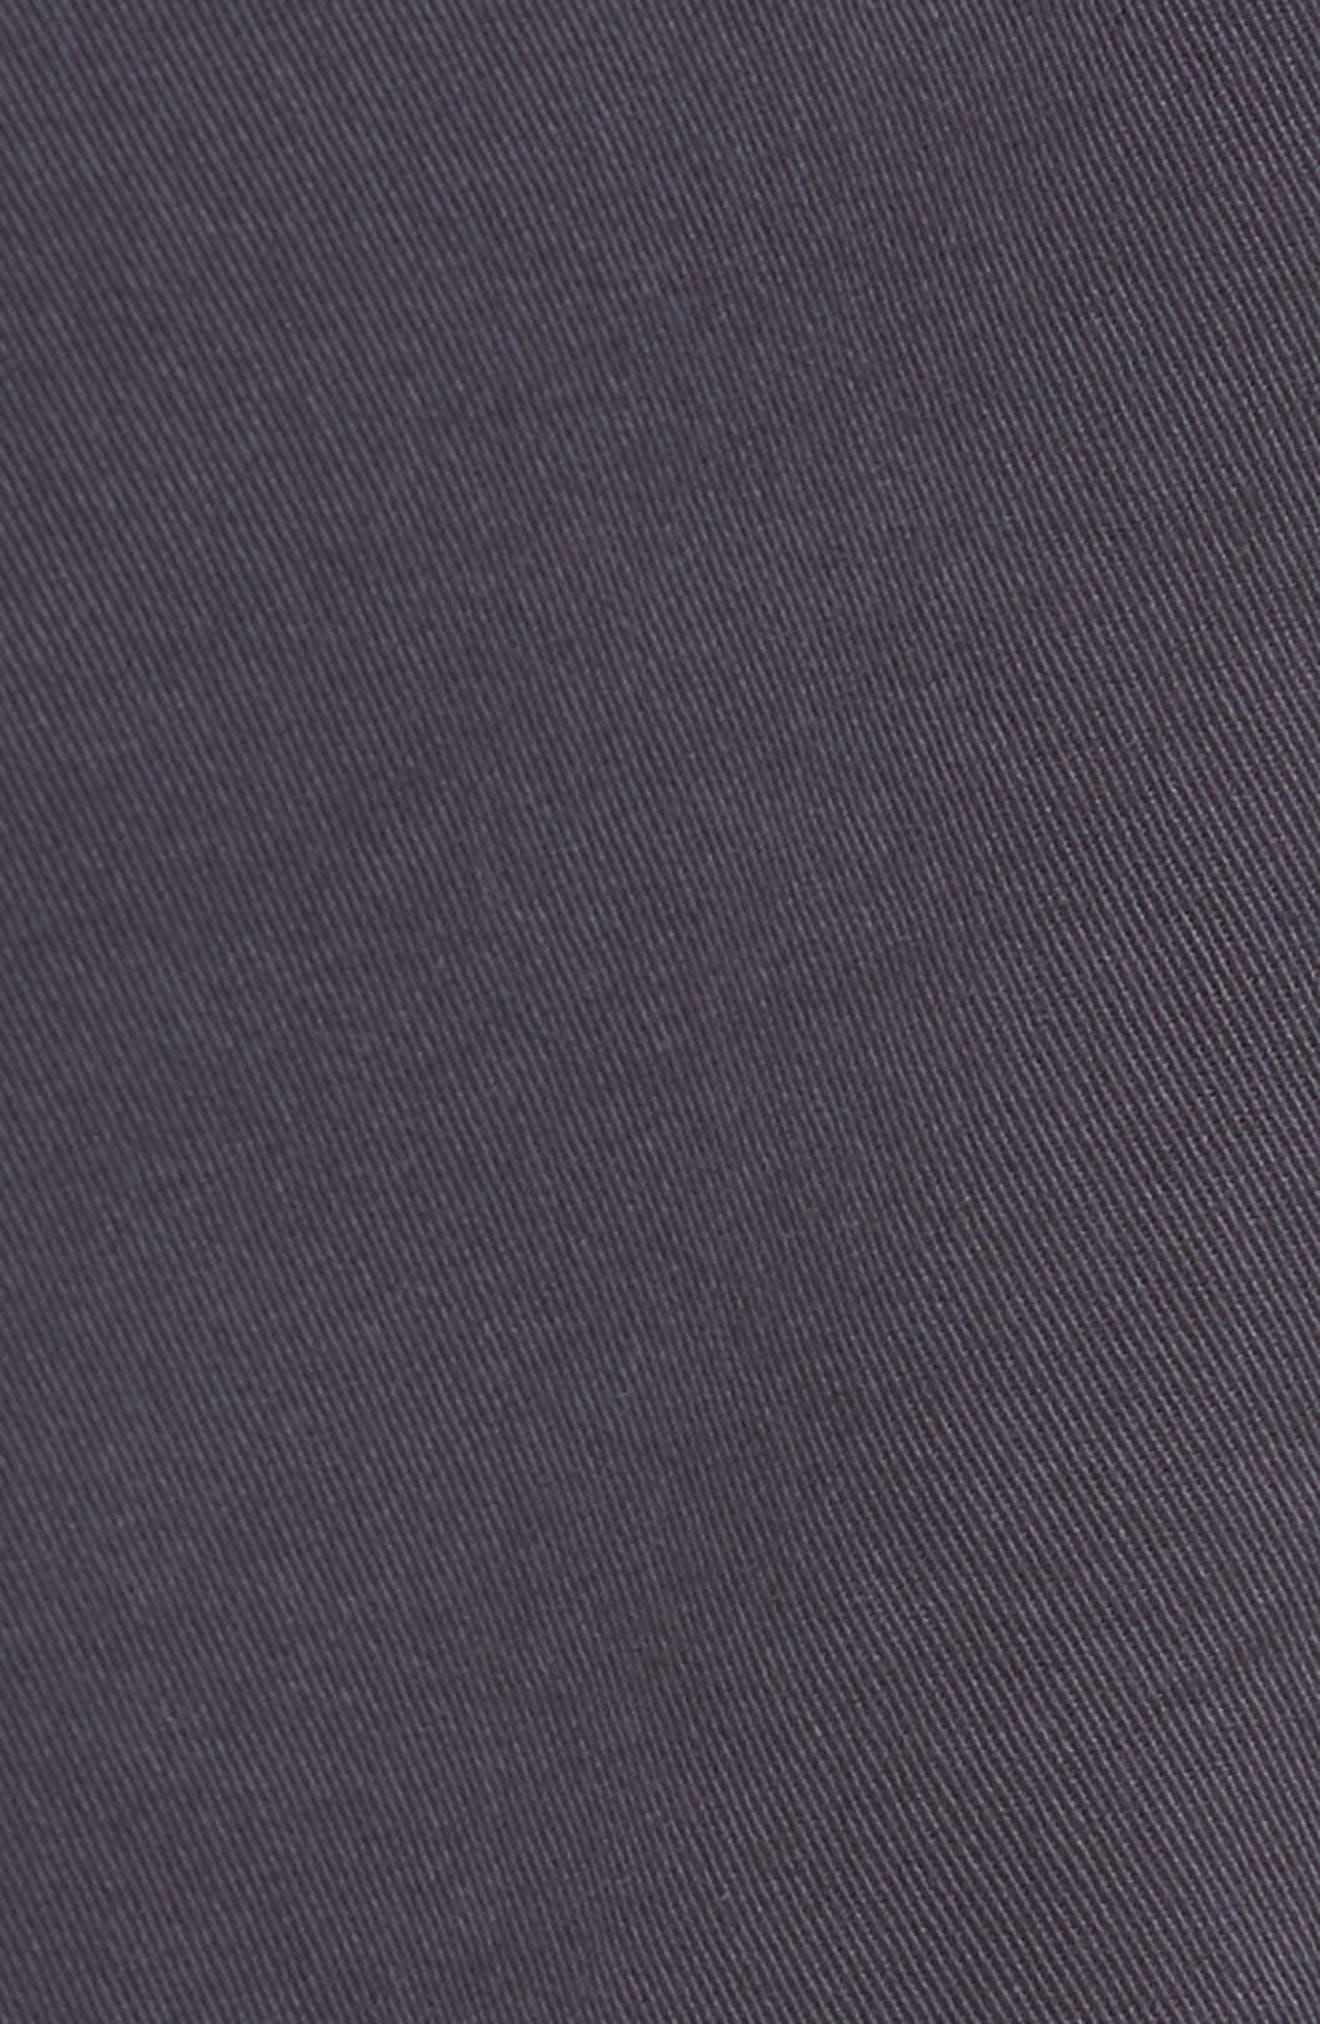 Straight Fit Vintage Twill Pants,                             Alternate thumbnail 5, color,                             410